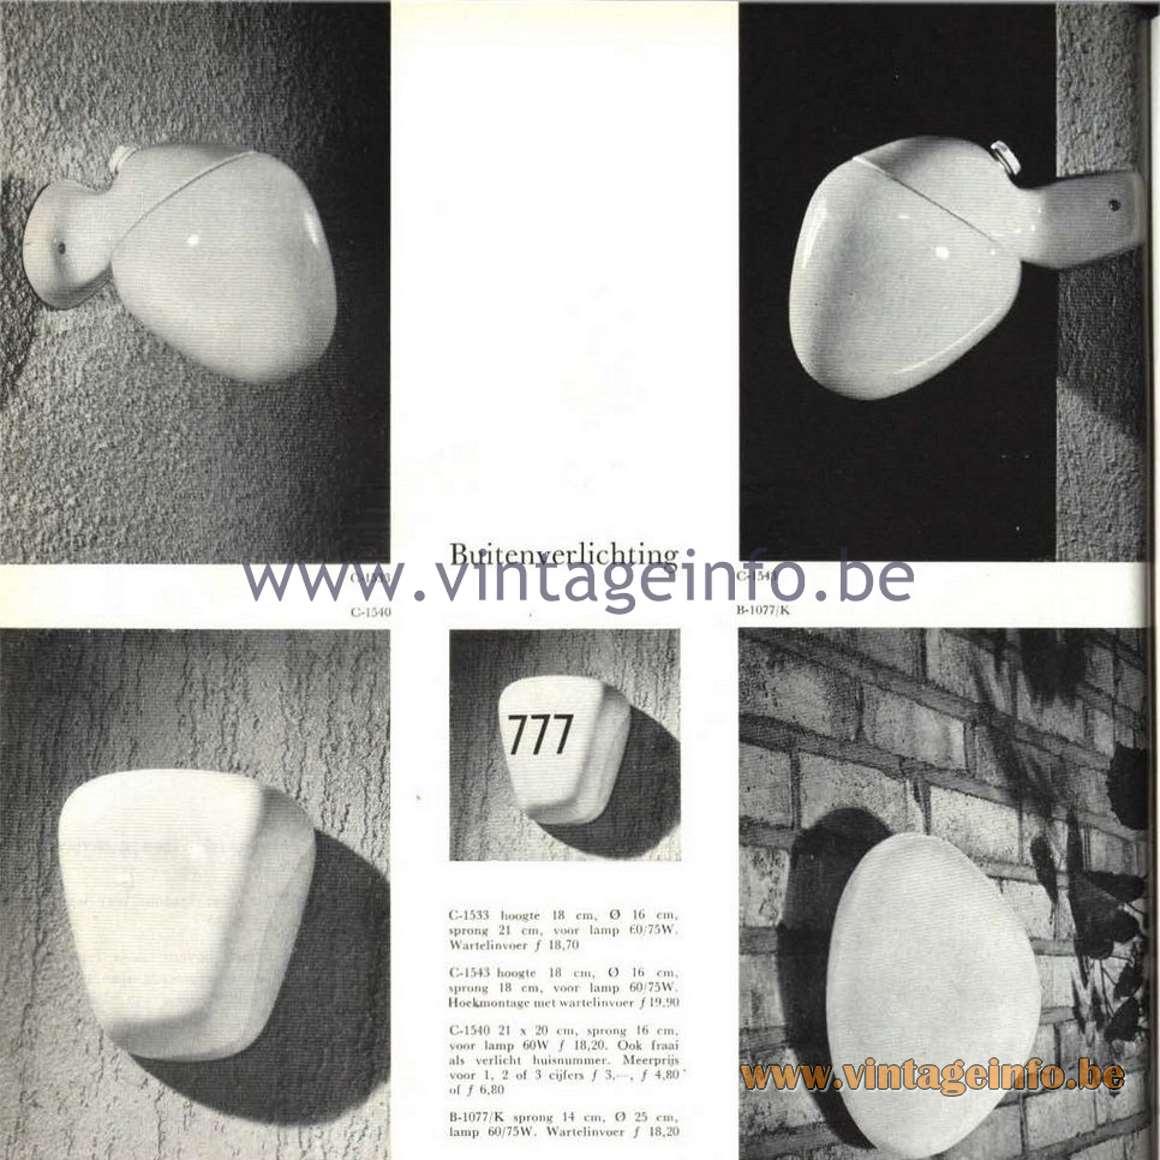 Wagenfeld WV 339 flush mount - Designer: Wilhelm Wagenfeld (1900-1990)